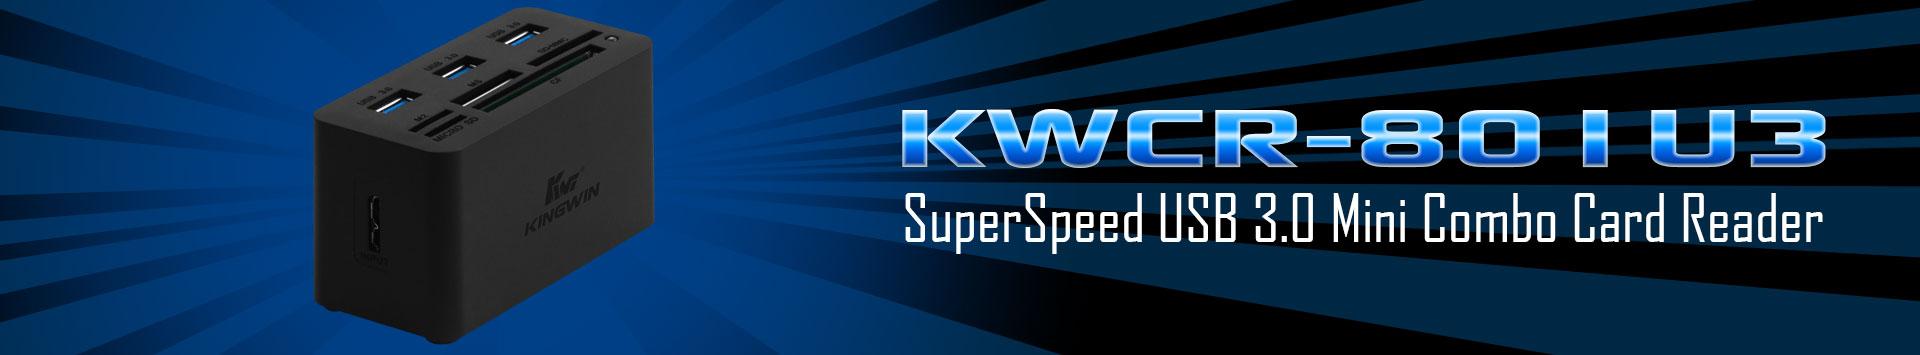 KWCR_801U3_banner_BLACK